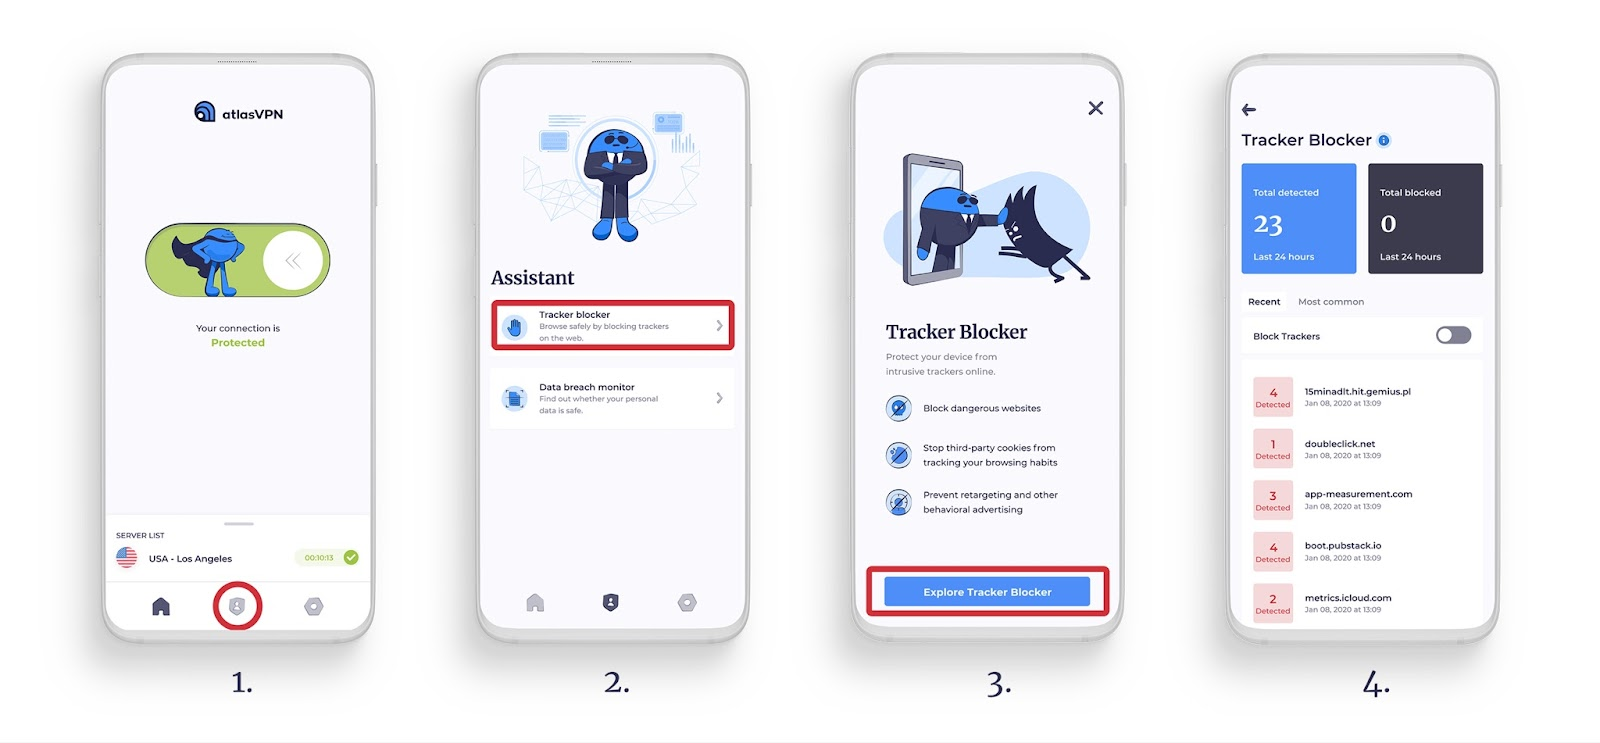 Tracker Blocker product shots (steps 1 to 4)